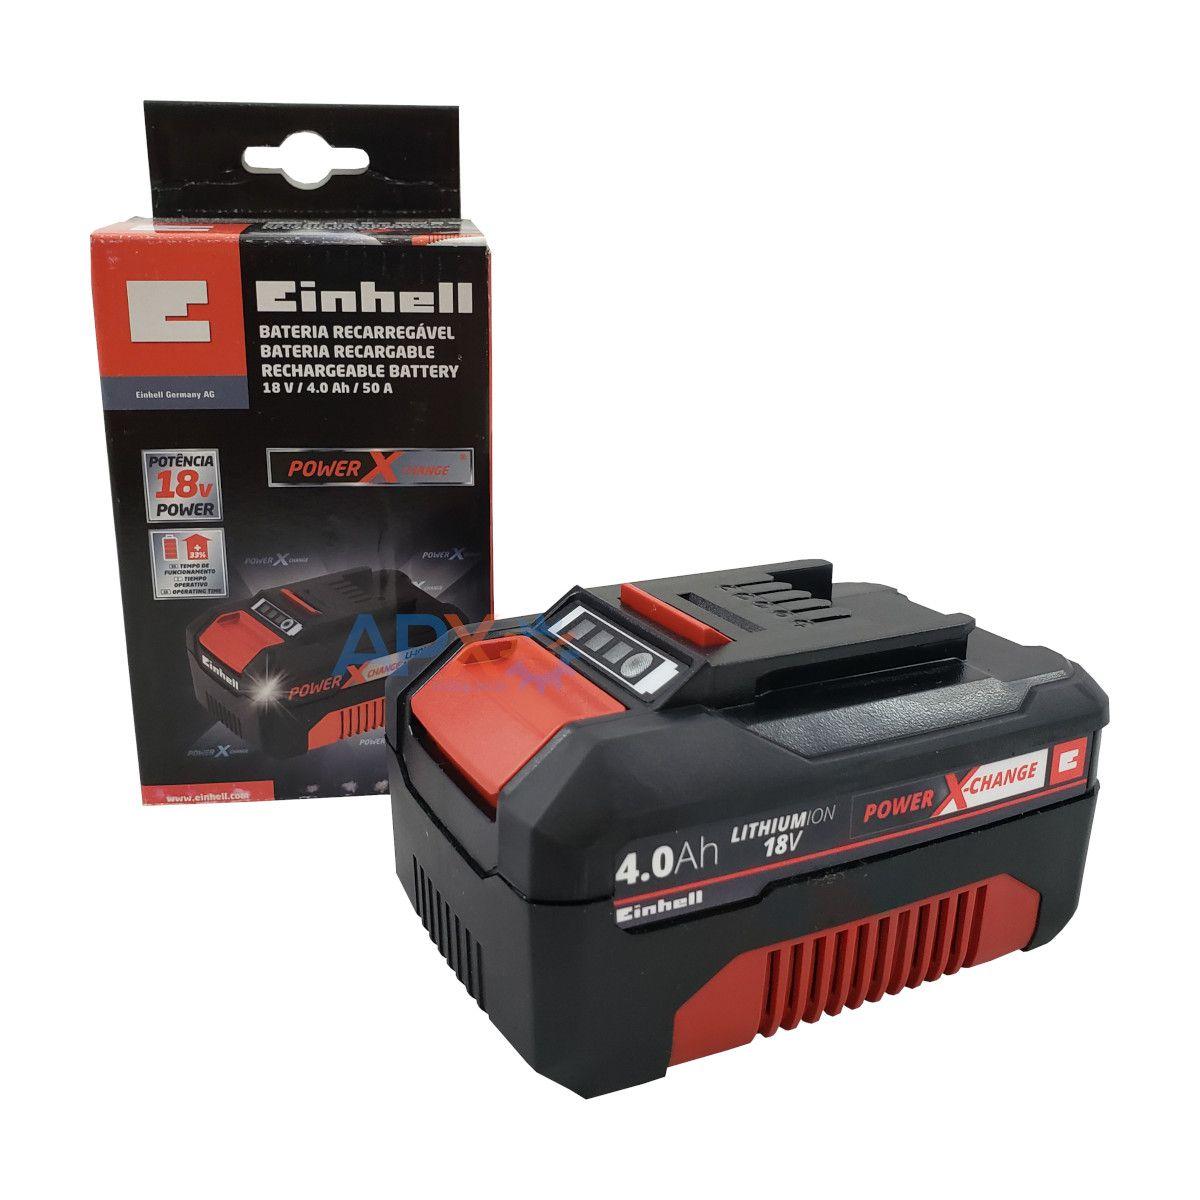 Bateria de 4.0 Ah power X-Change 18V 45.114.12